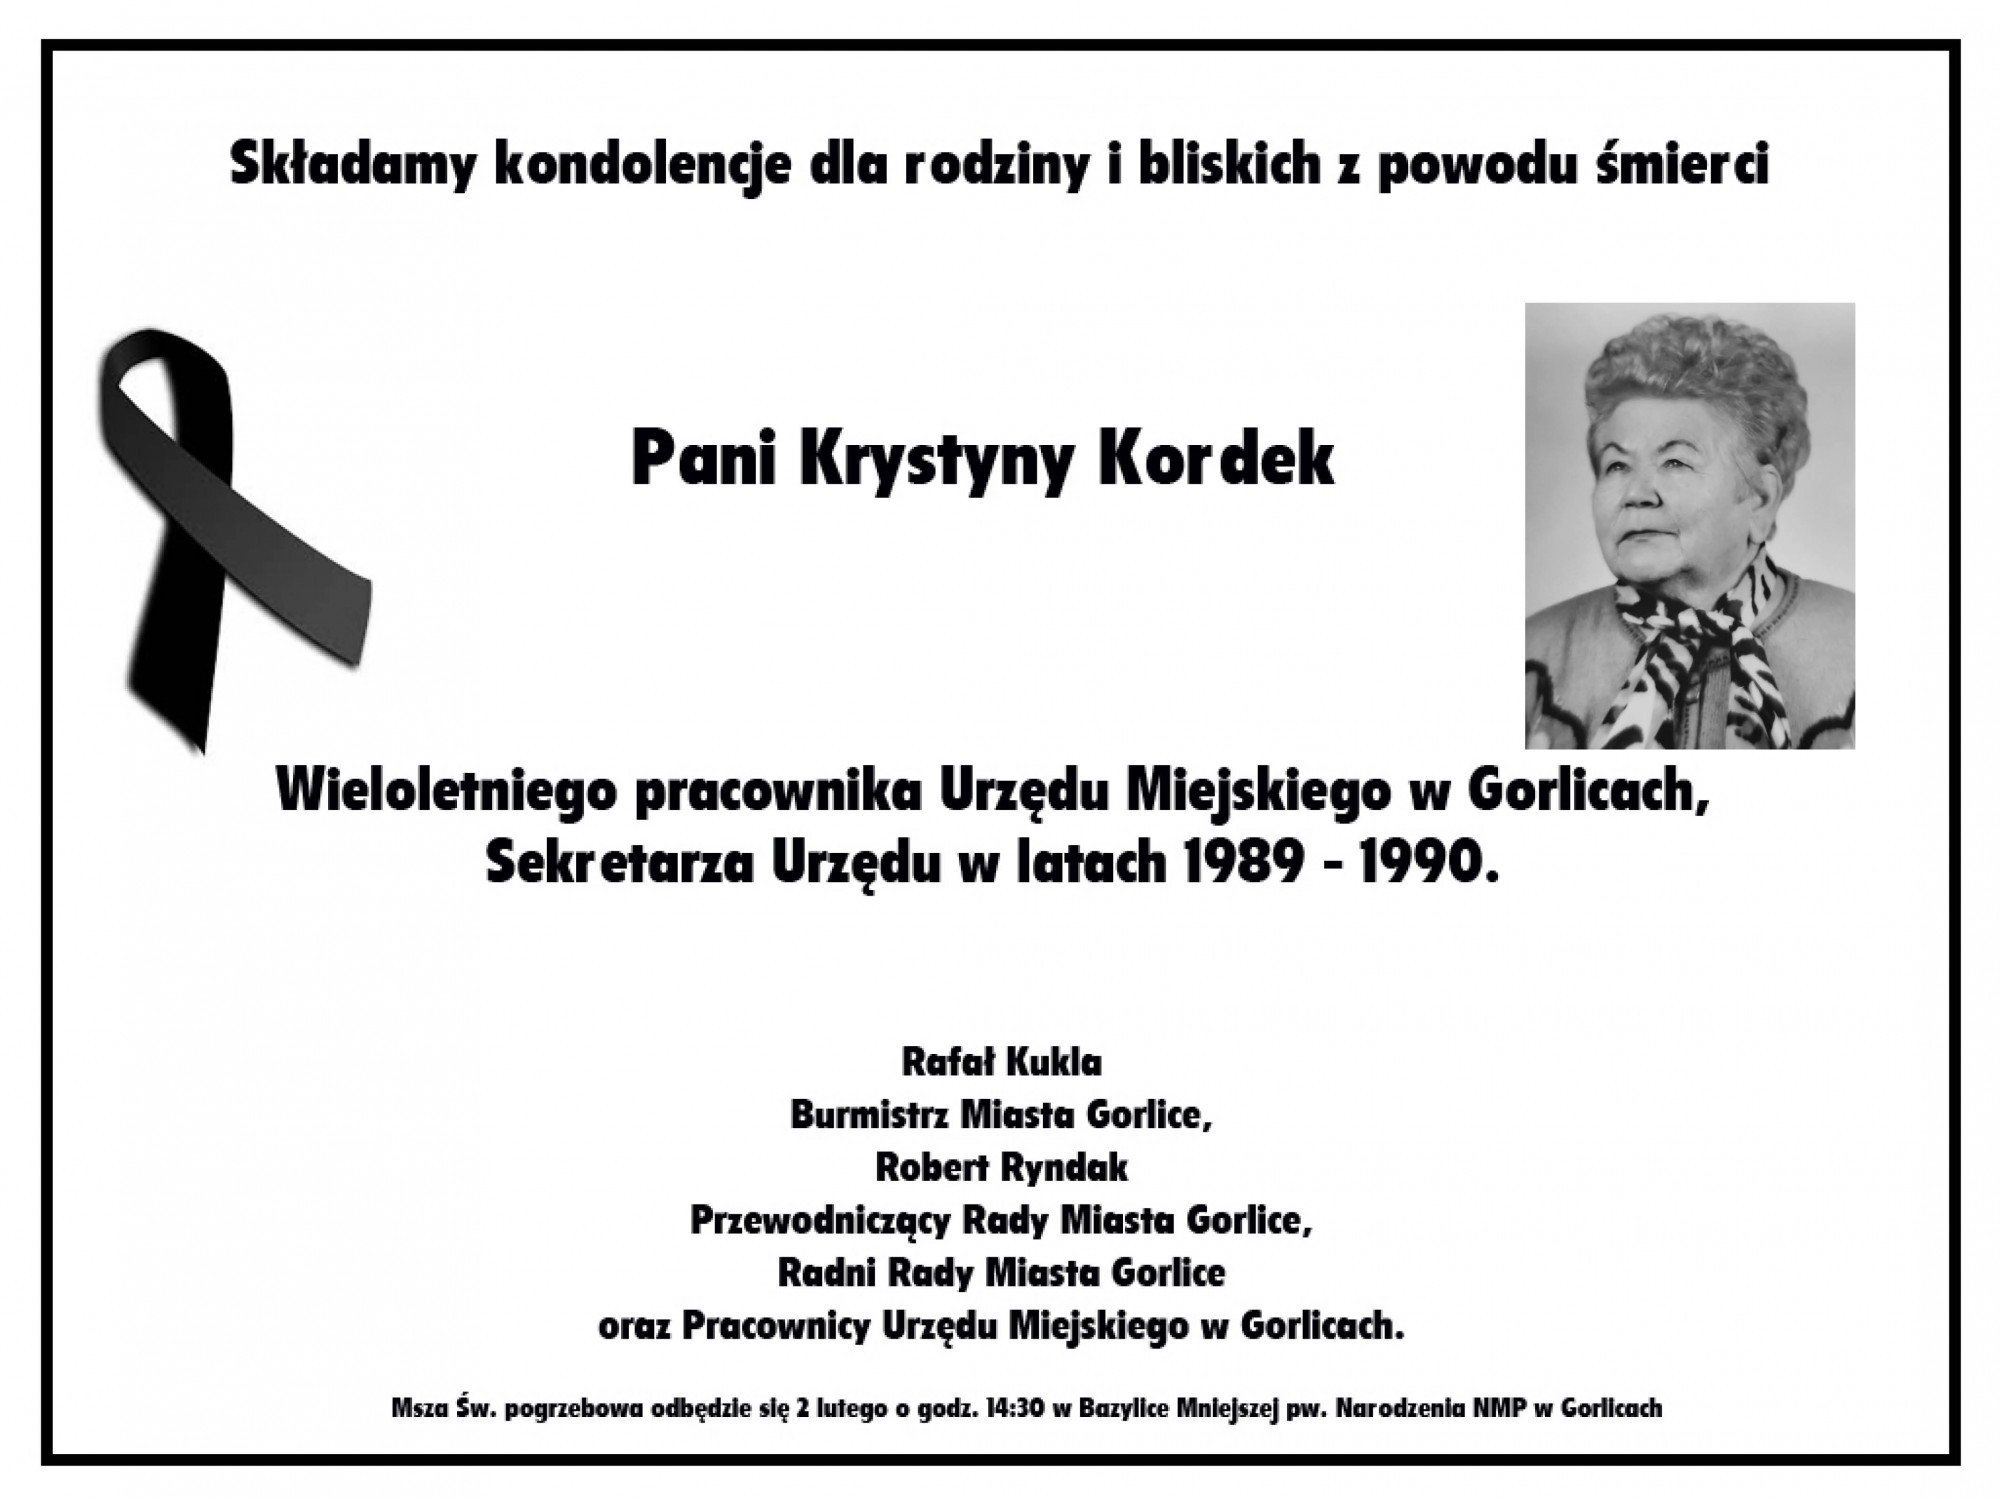 Nekrolog Krystyny Kordek.